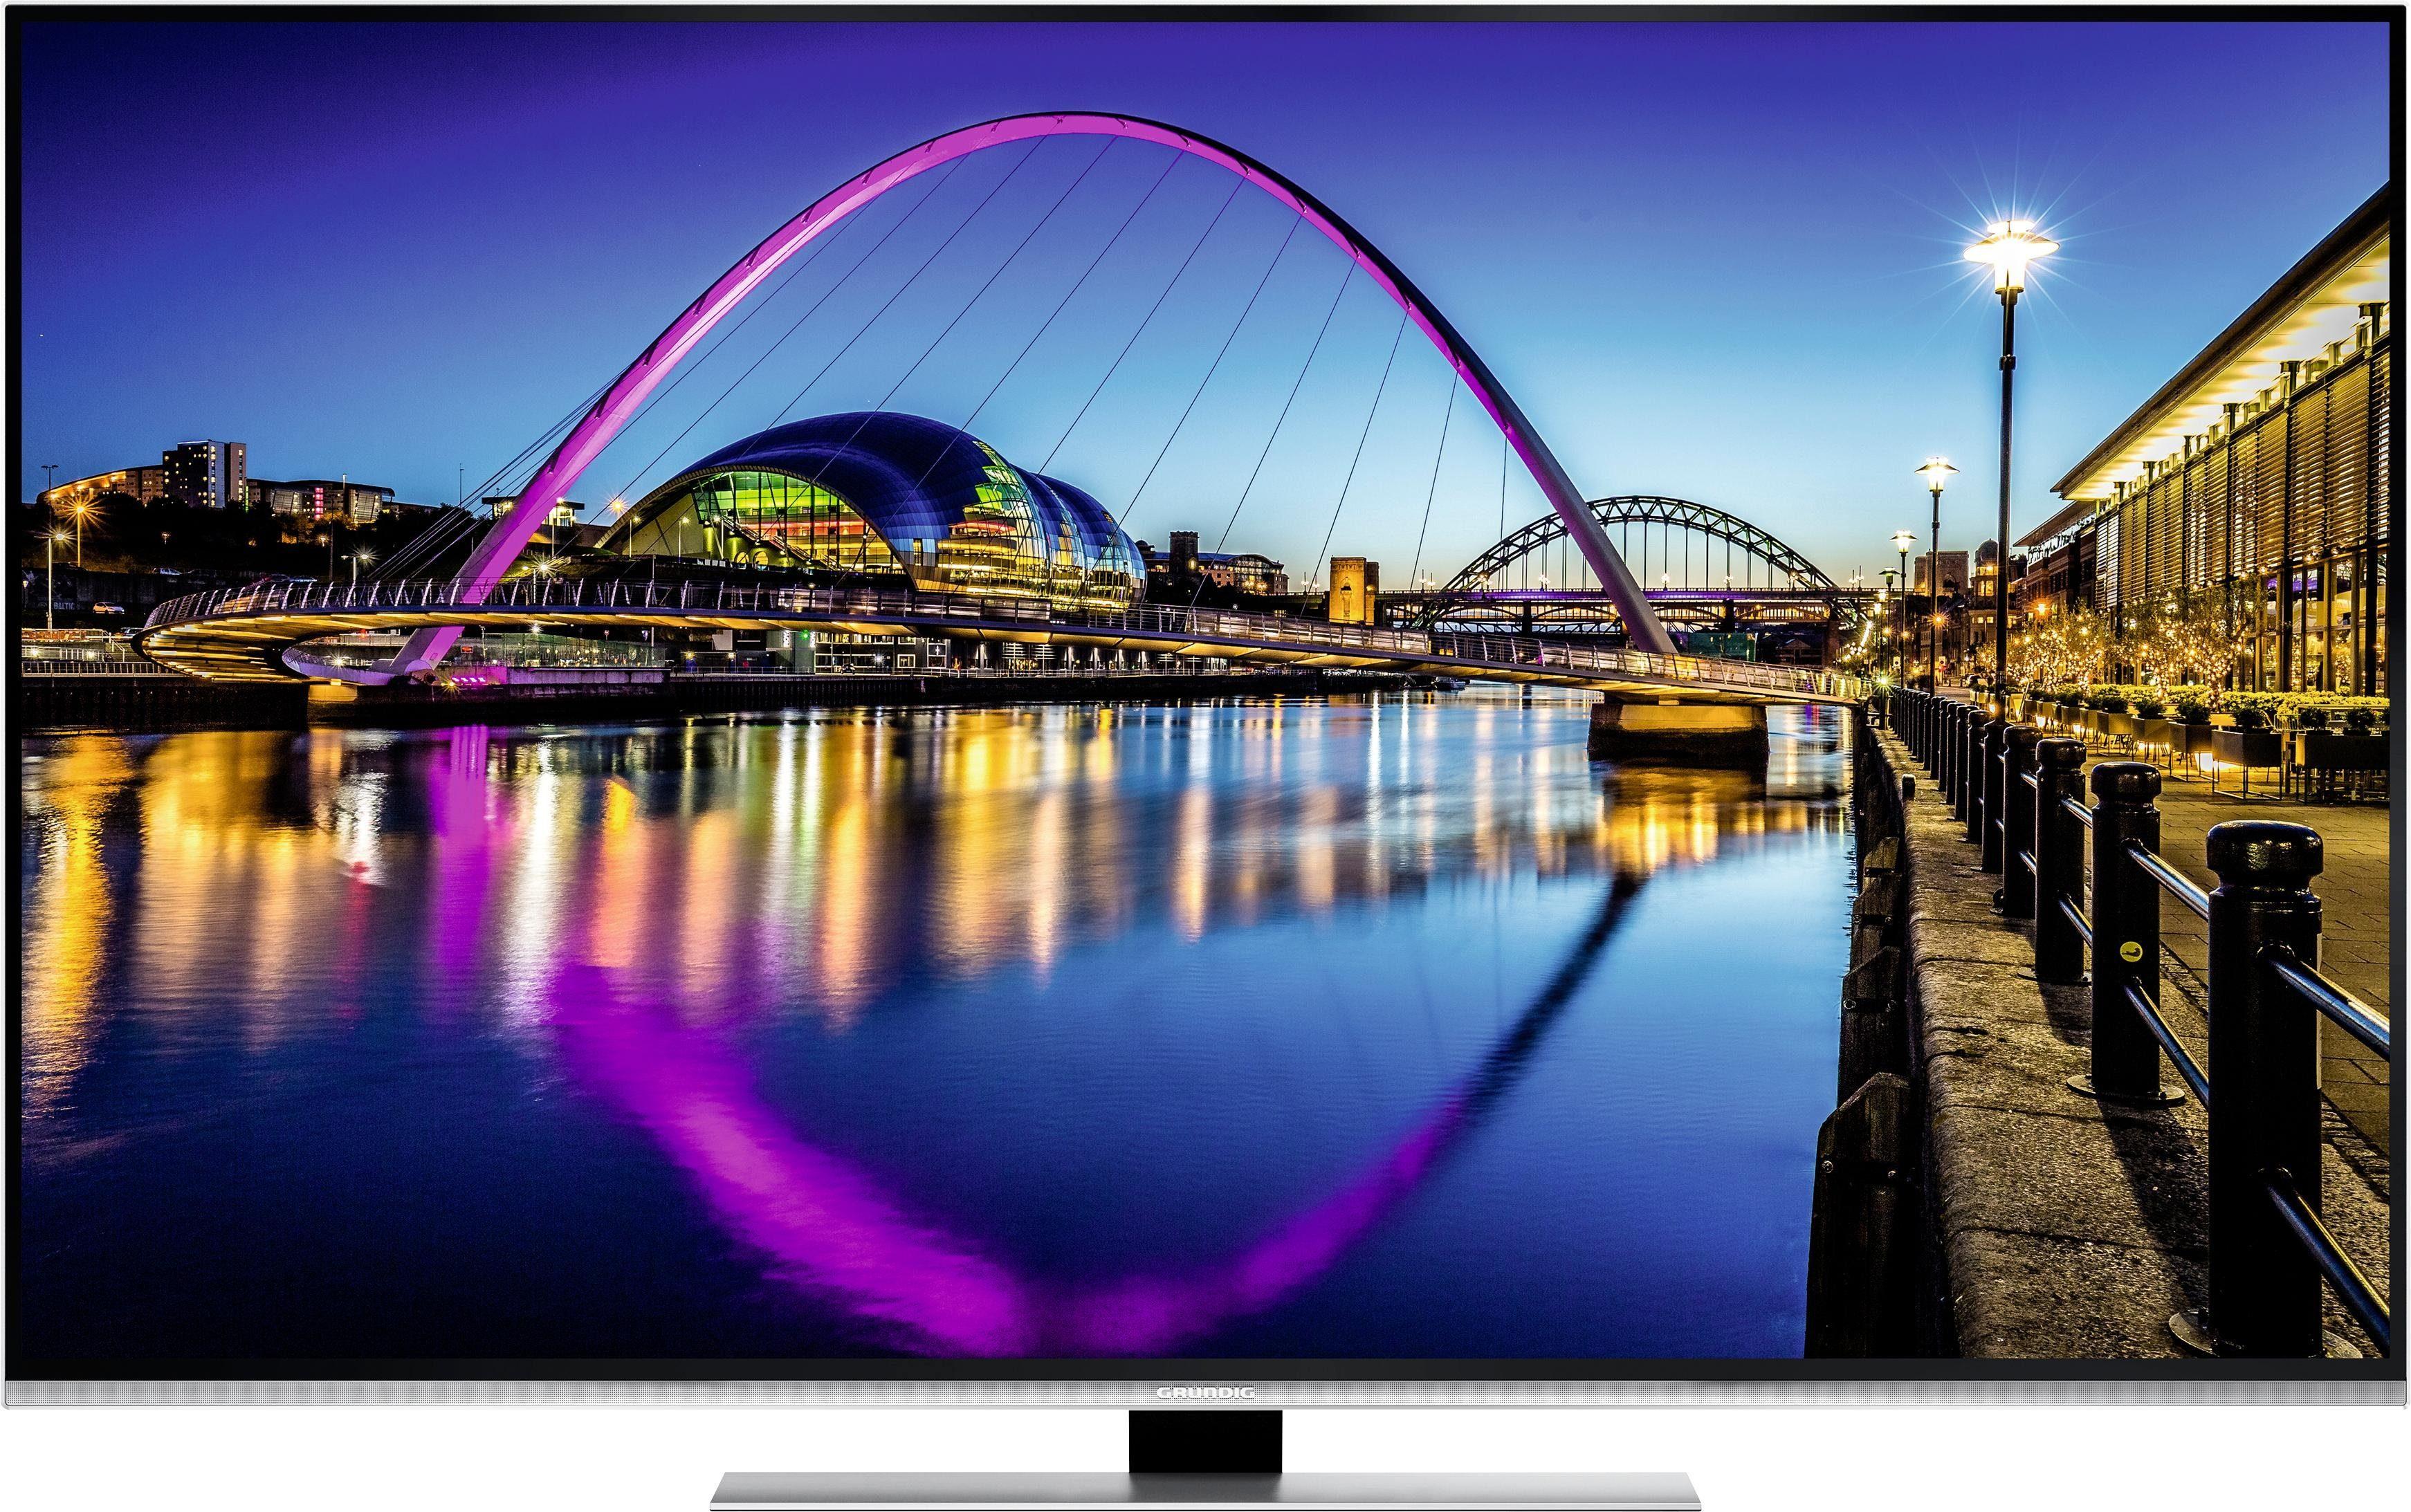 Grundig 49 GUS 9890 LED-Fernseher (123 cm/49 Zoll, 4K Ultra HD, Smart-TV)